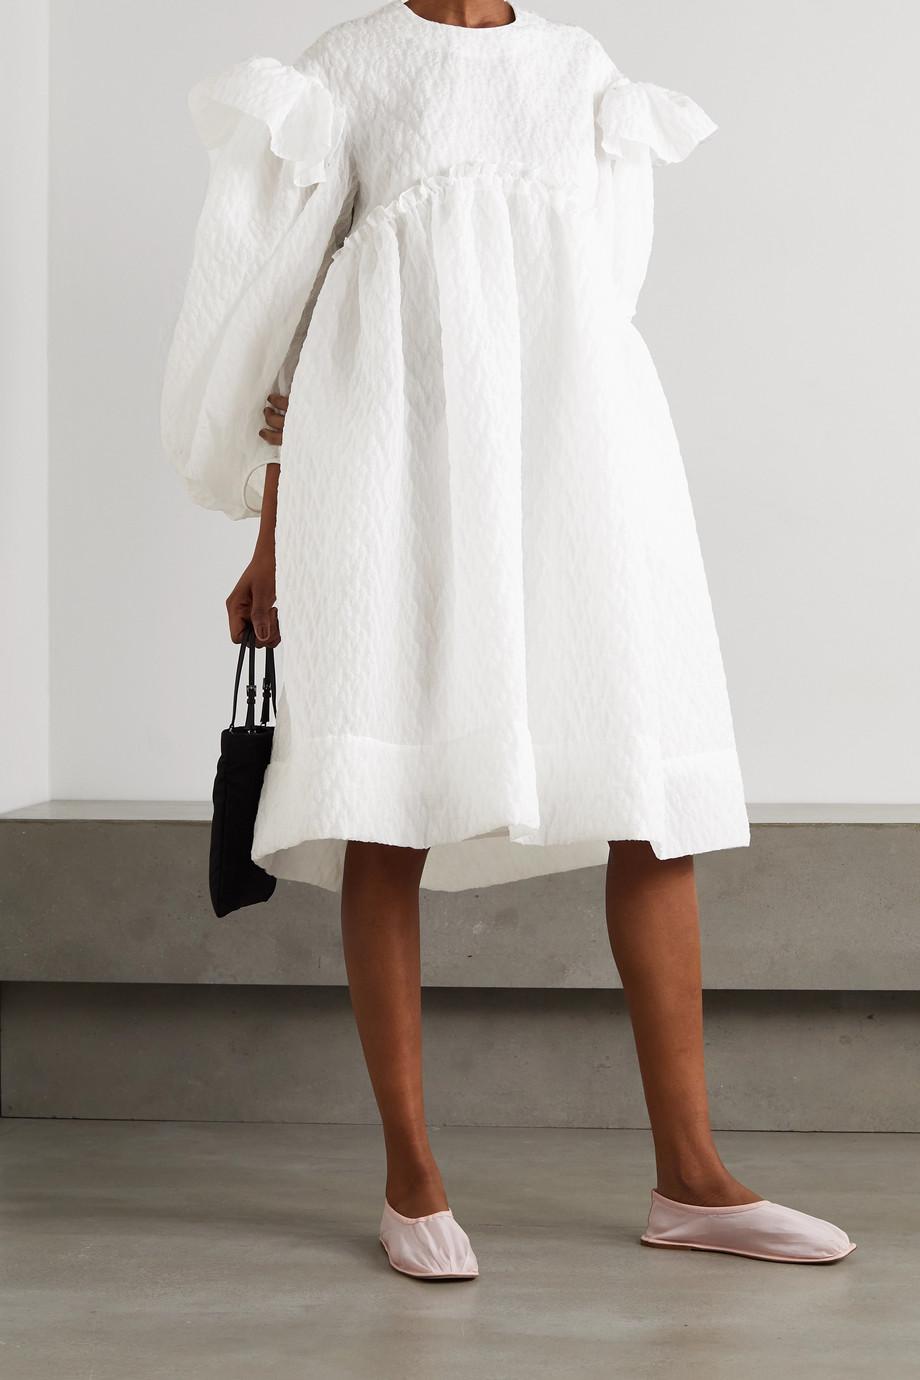 Simone Rocha Oversized ruffled cloqué dress